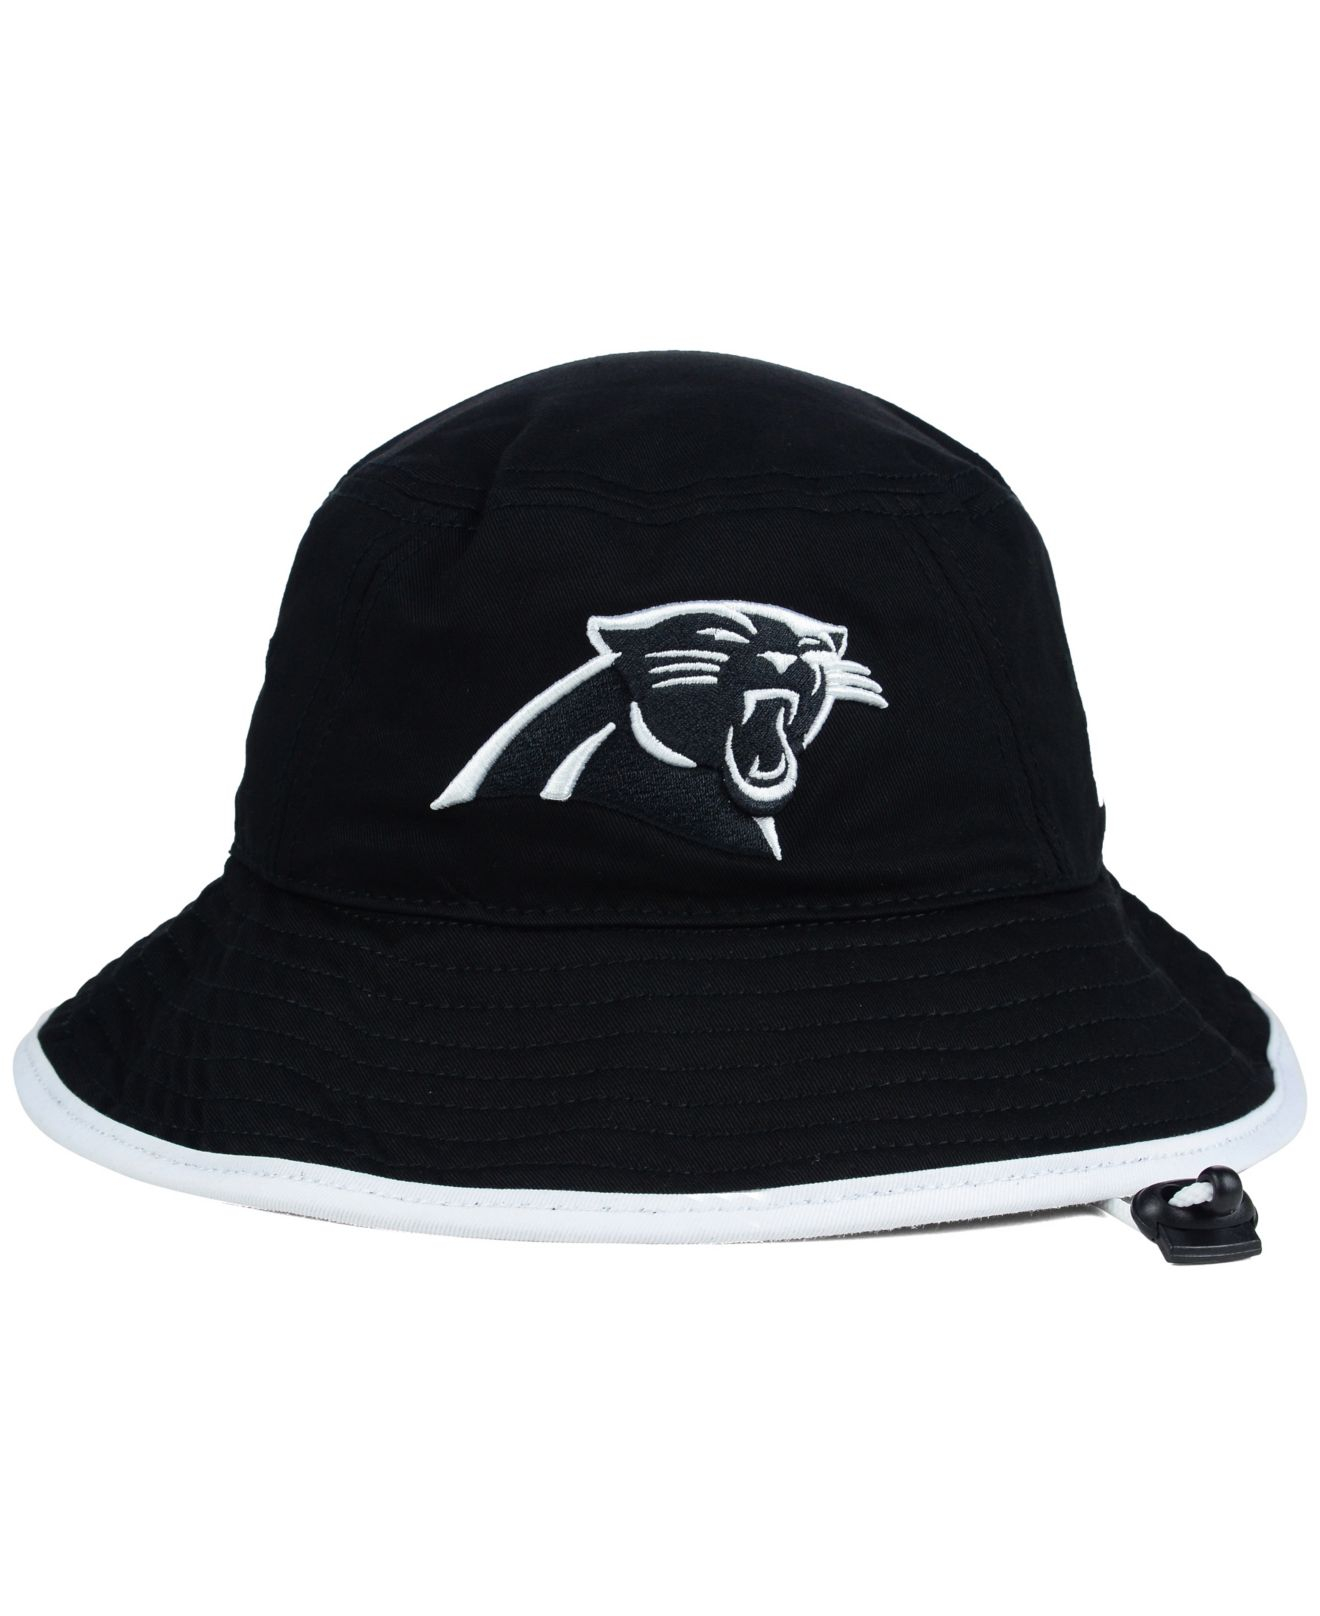 f89c05c695e ... inexpensive lyst ktz carolina panthers nfl black white bucket hat in  black 3e6c1 7358f